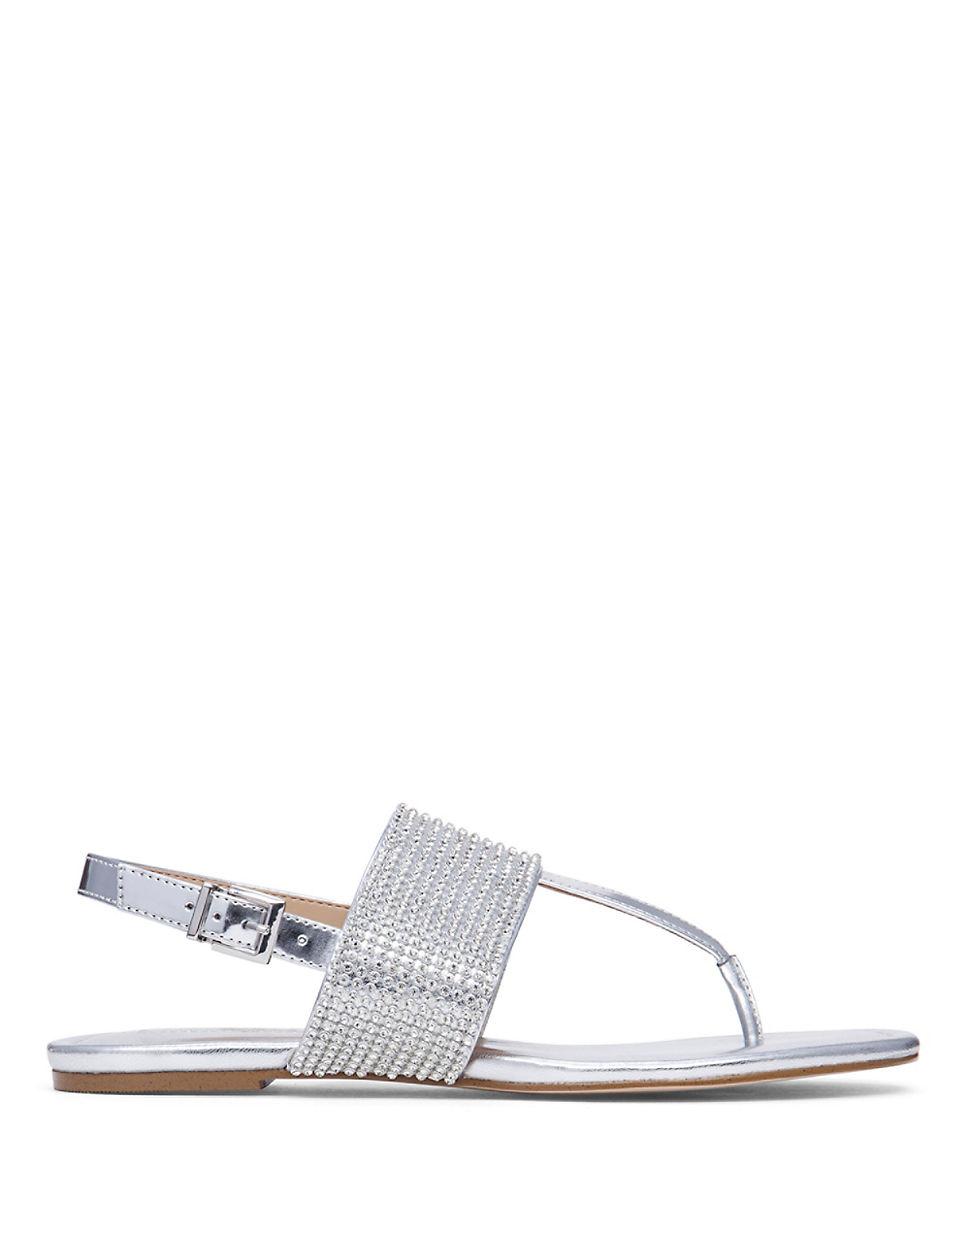 e5f7ff27ccc434 Lyst - Bcbgeneration Wander Thong Sandals in Metallic